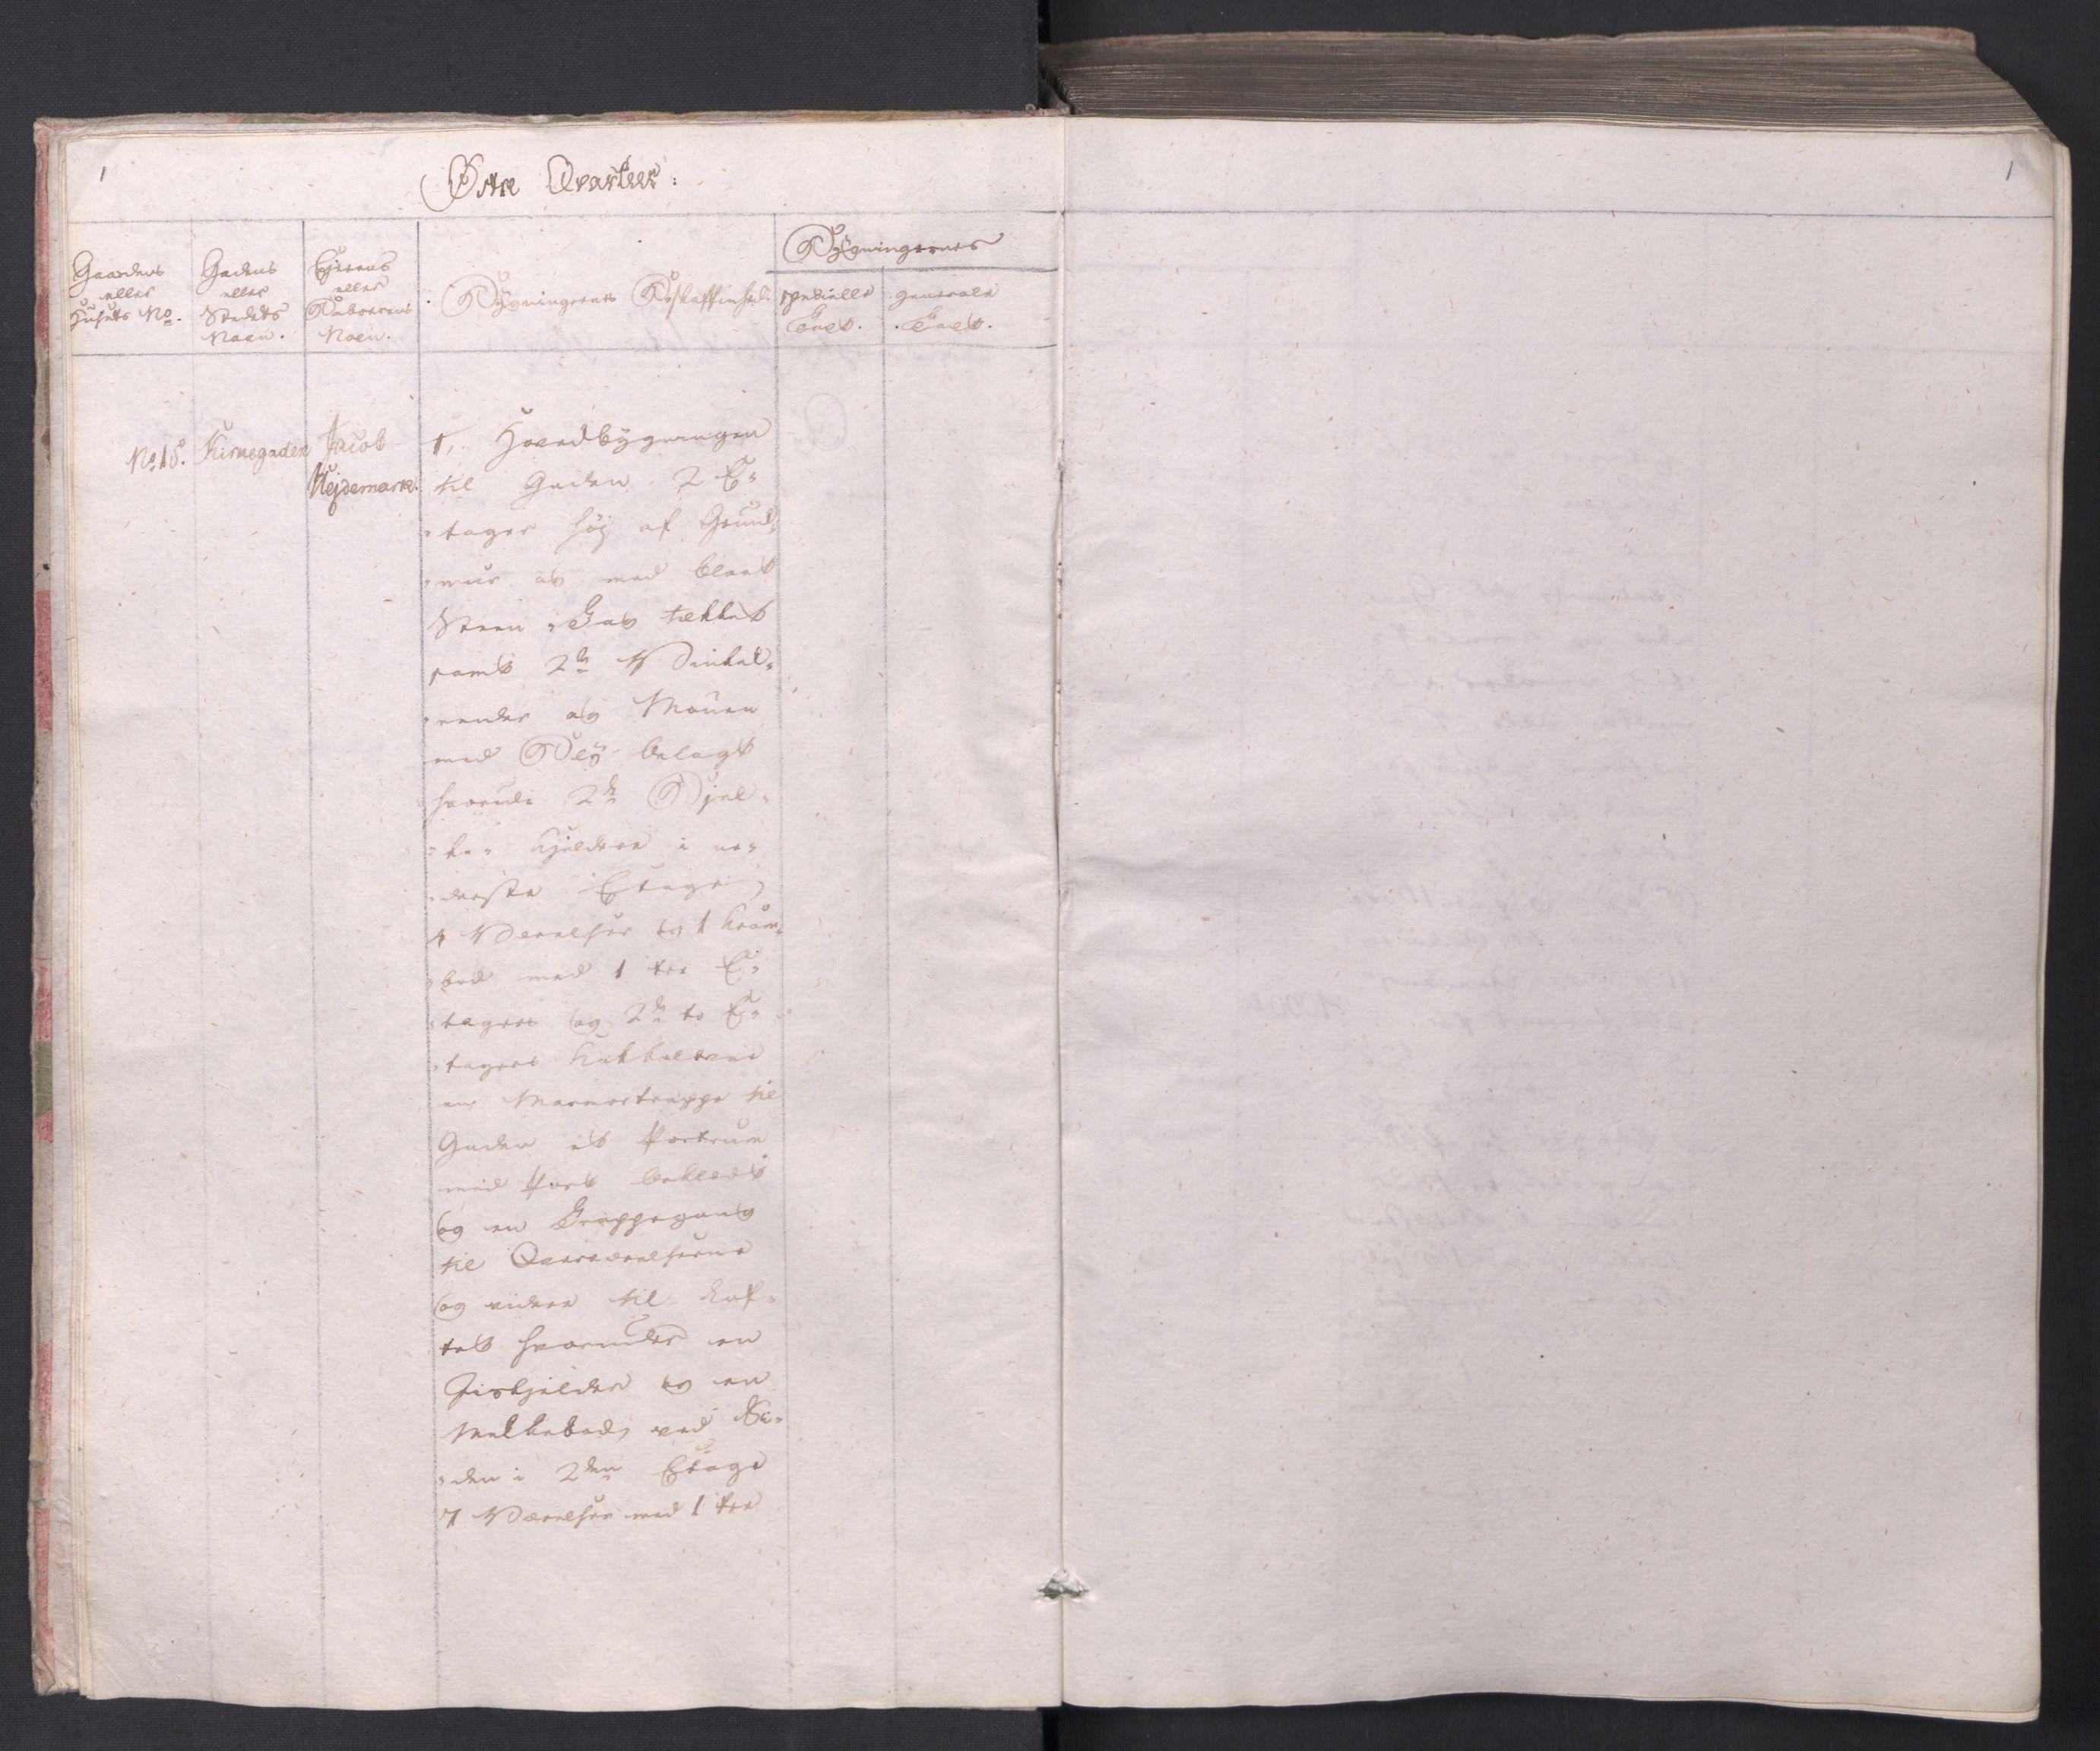 SAO, Kristiania stiftamt, I/Ia/L0015: Branntakster, 1797, s. 1